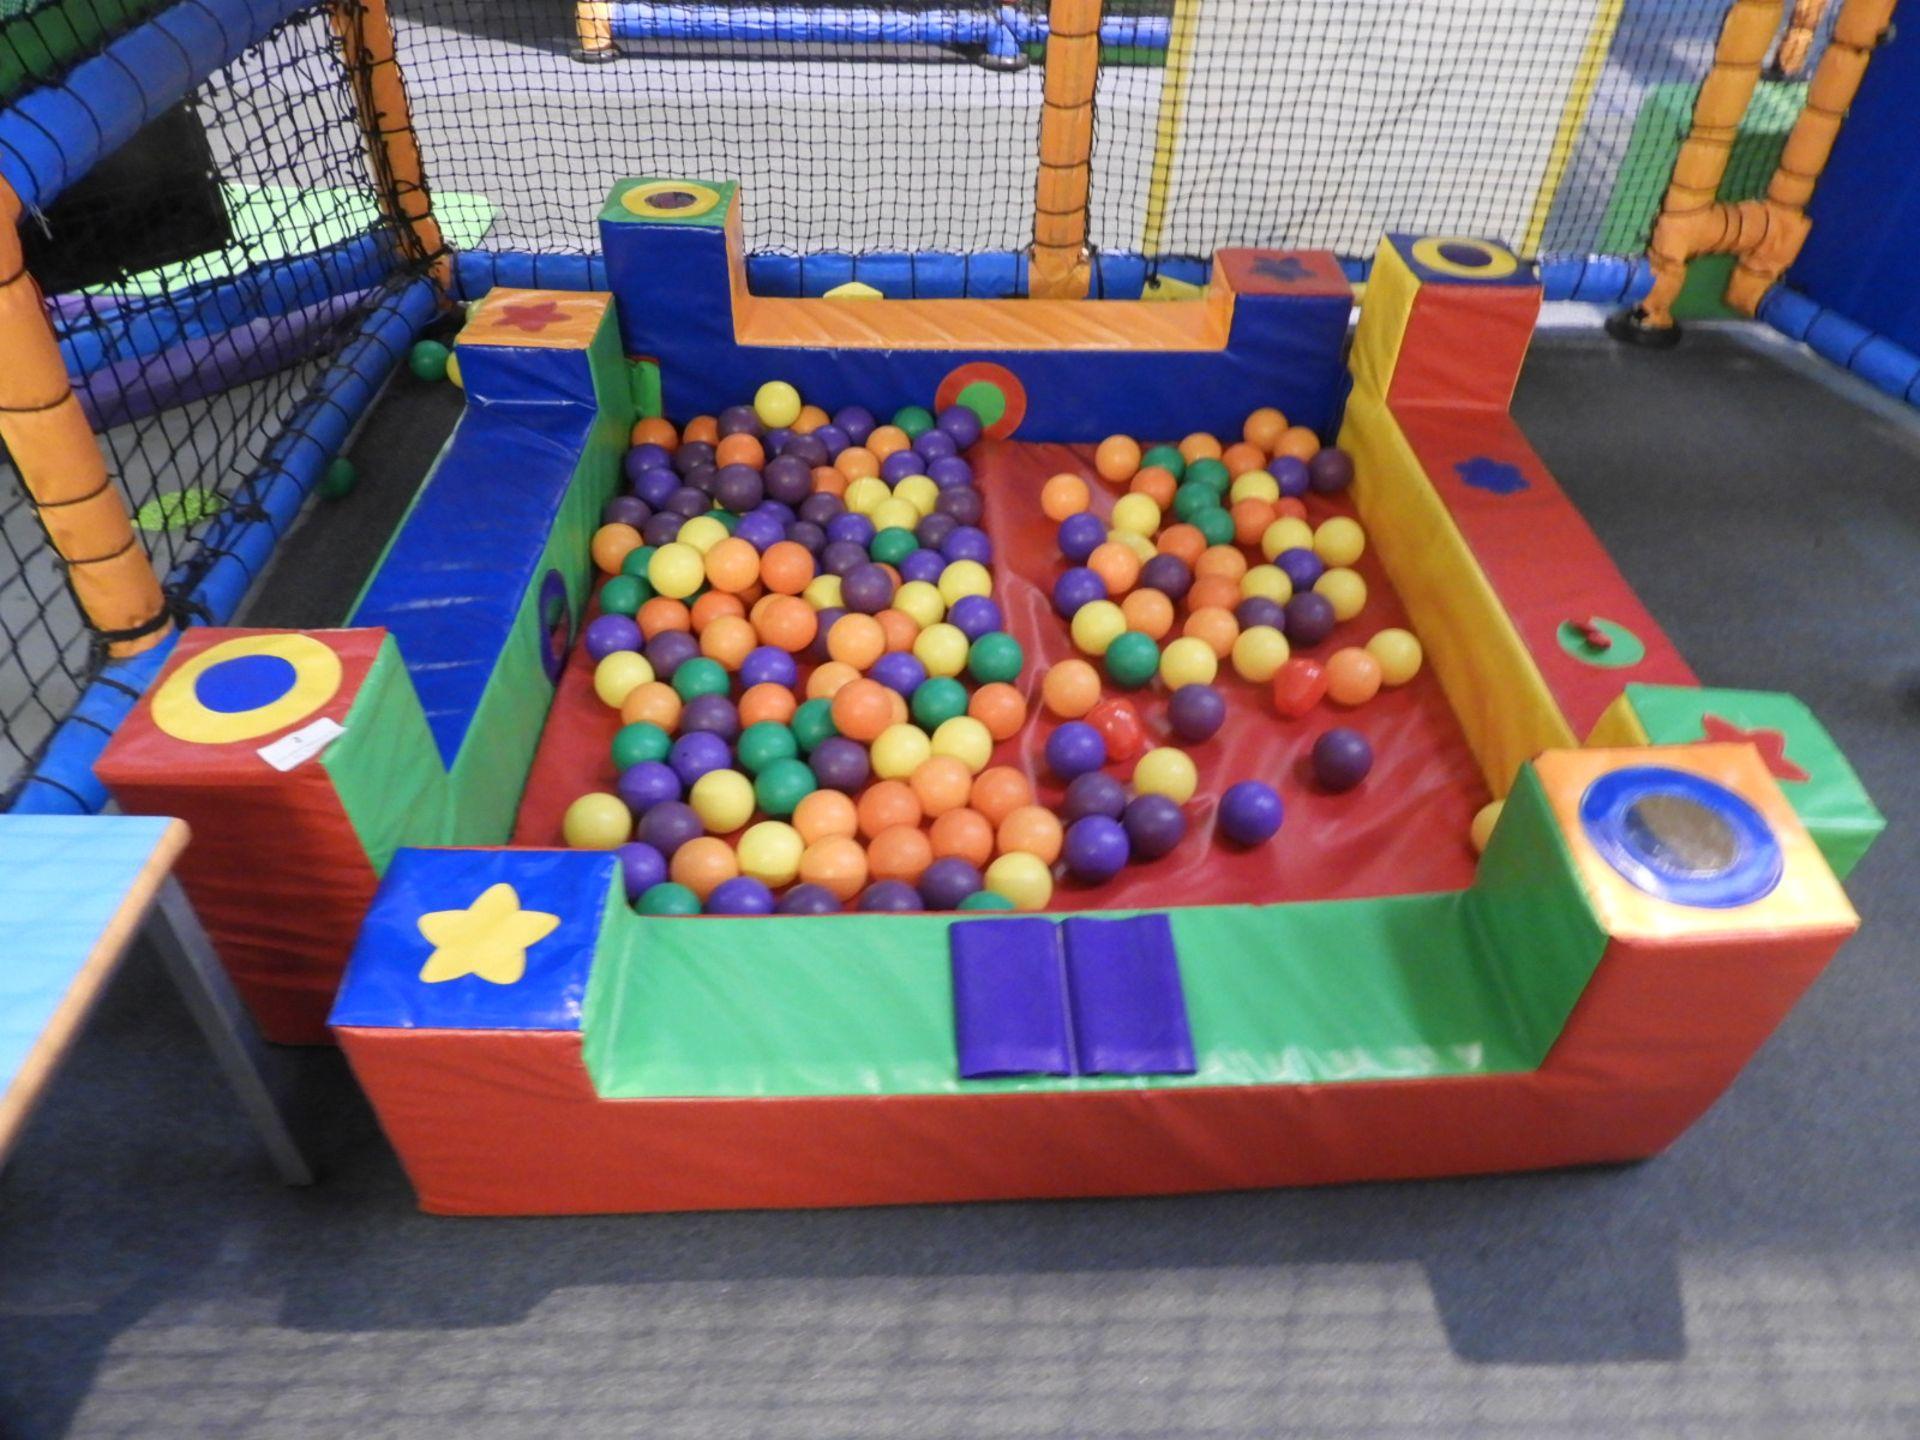 Lot 2 - *Children's Ball Pool